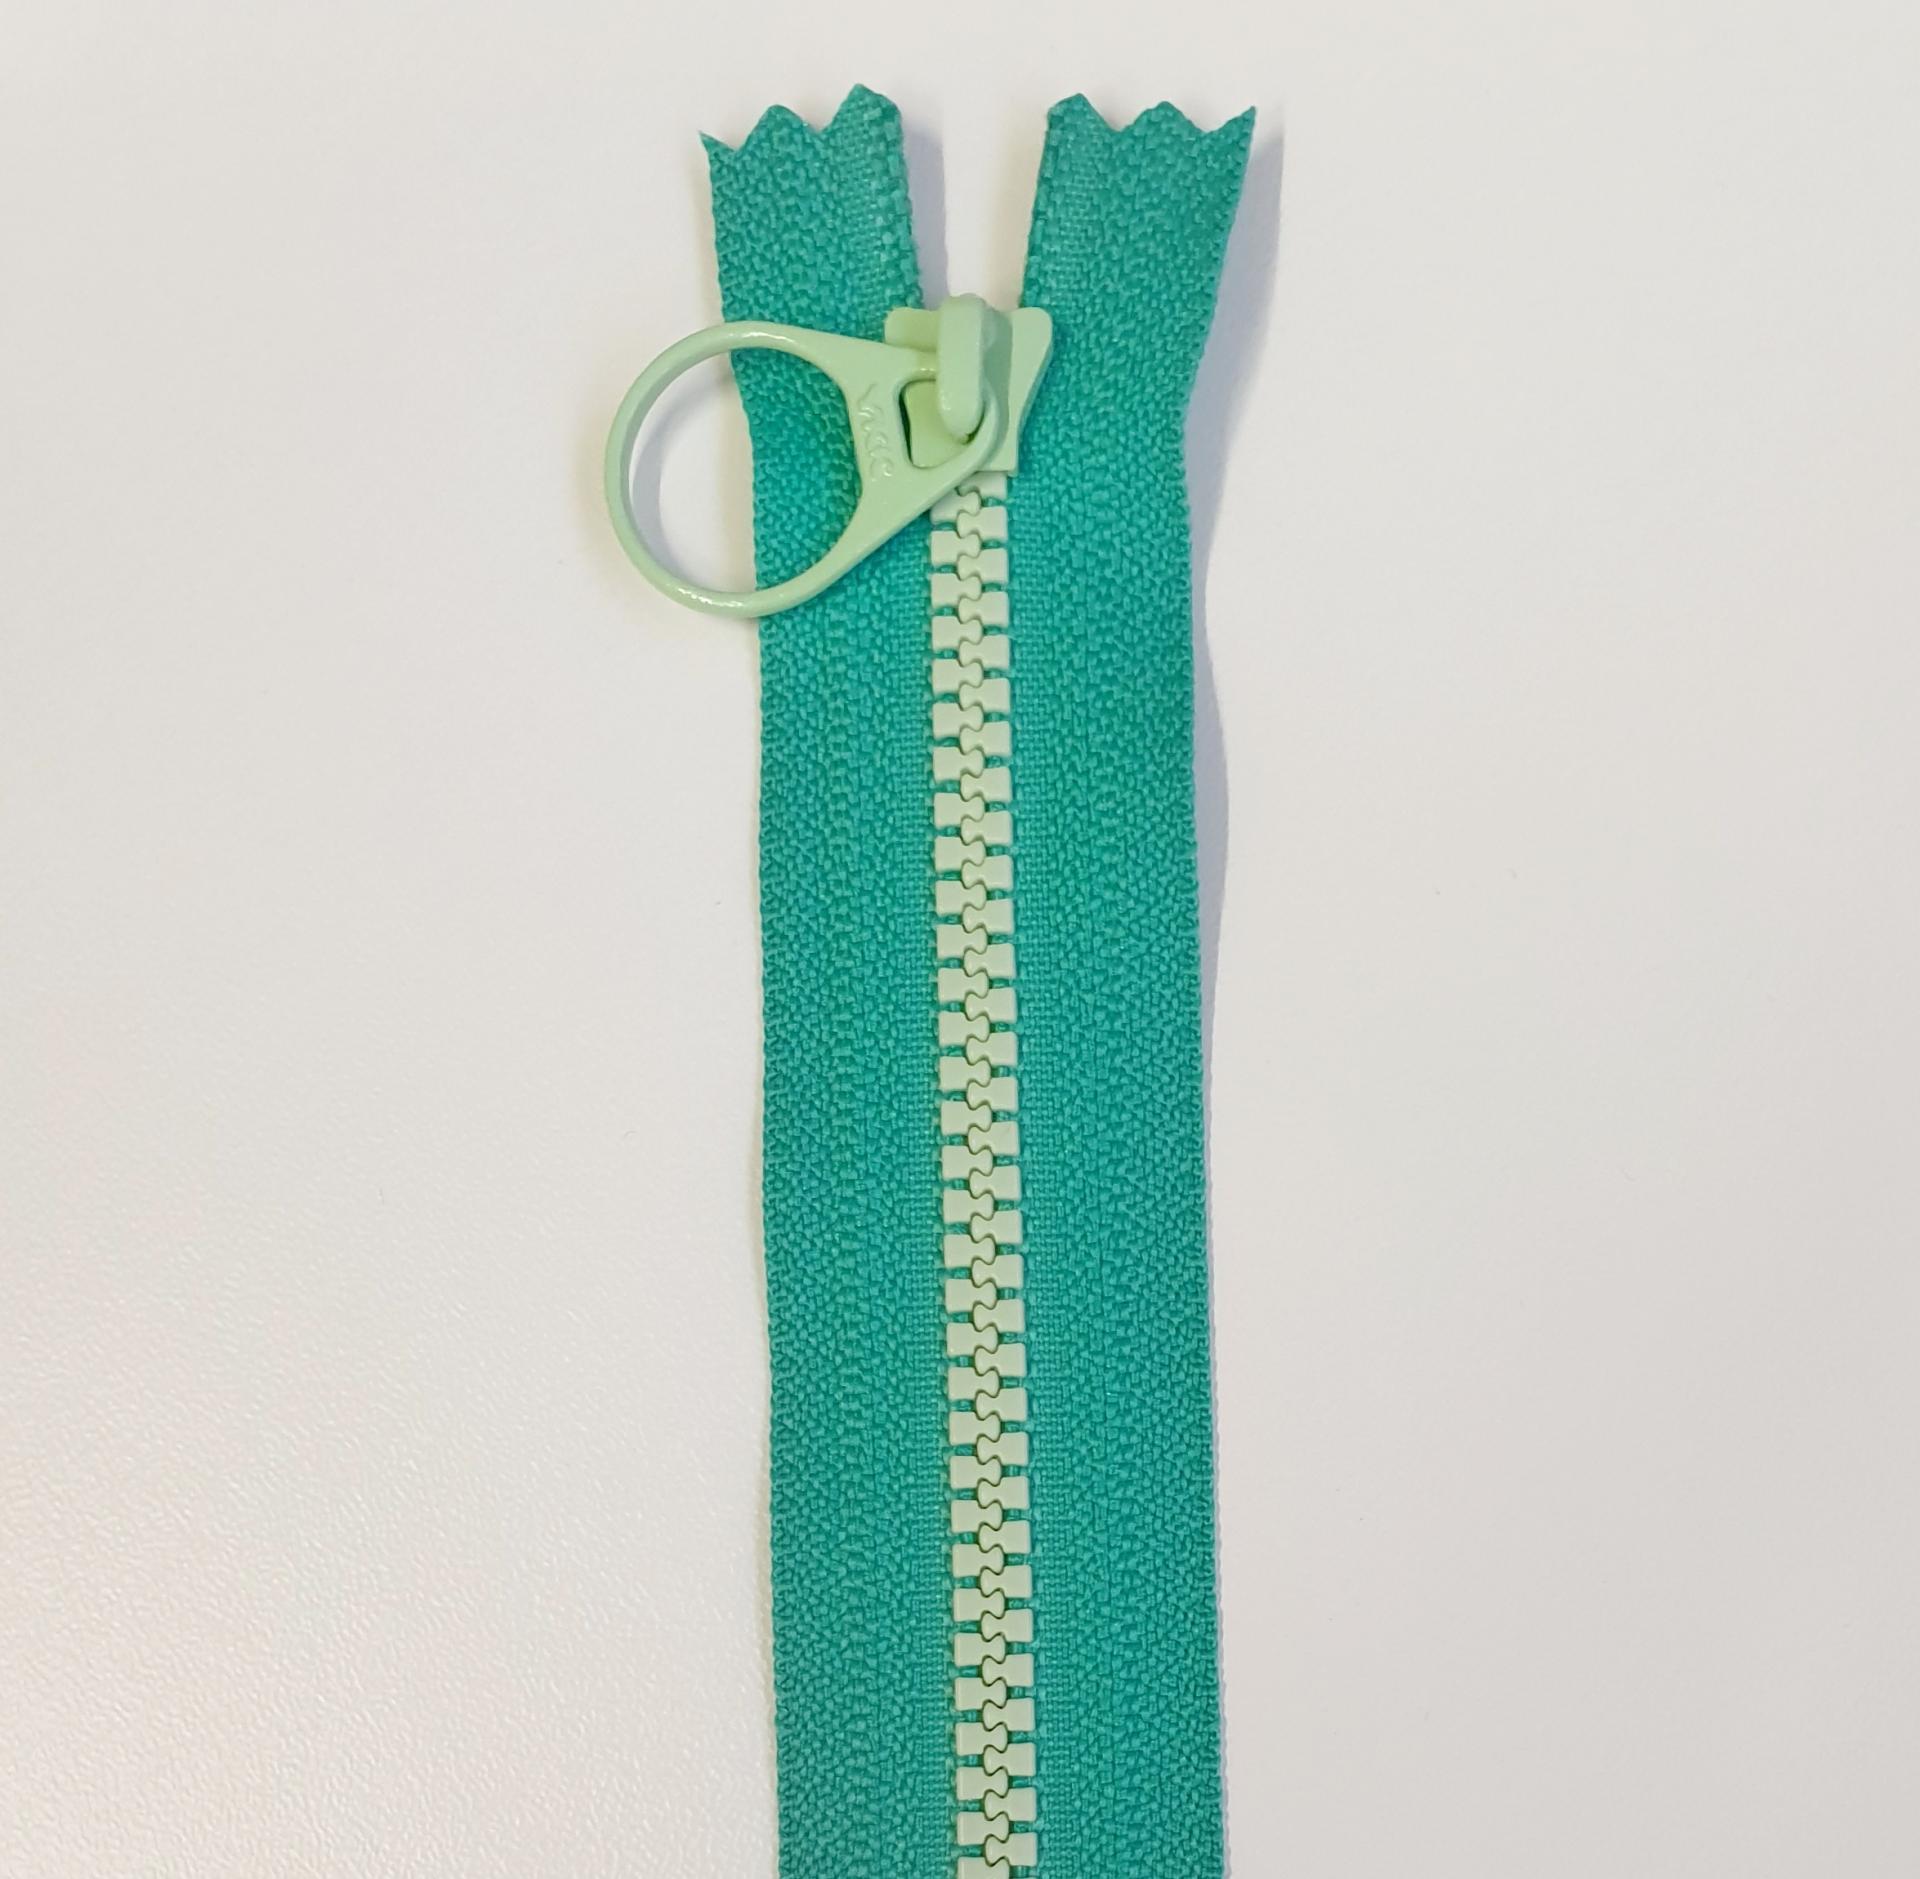 Cremallera Bi-Color 20cm Verde/Mint